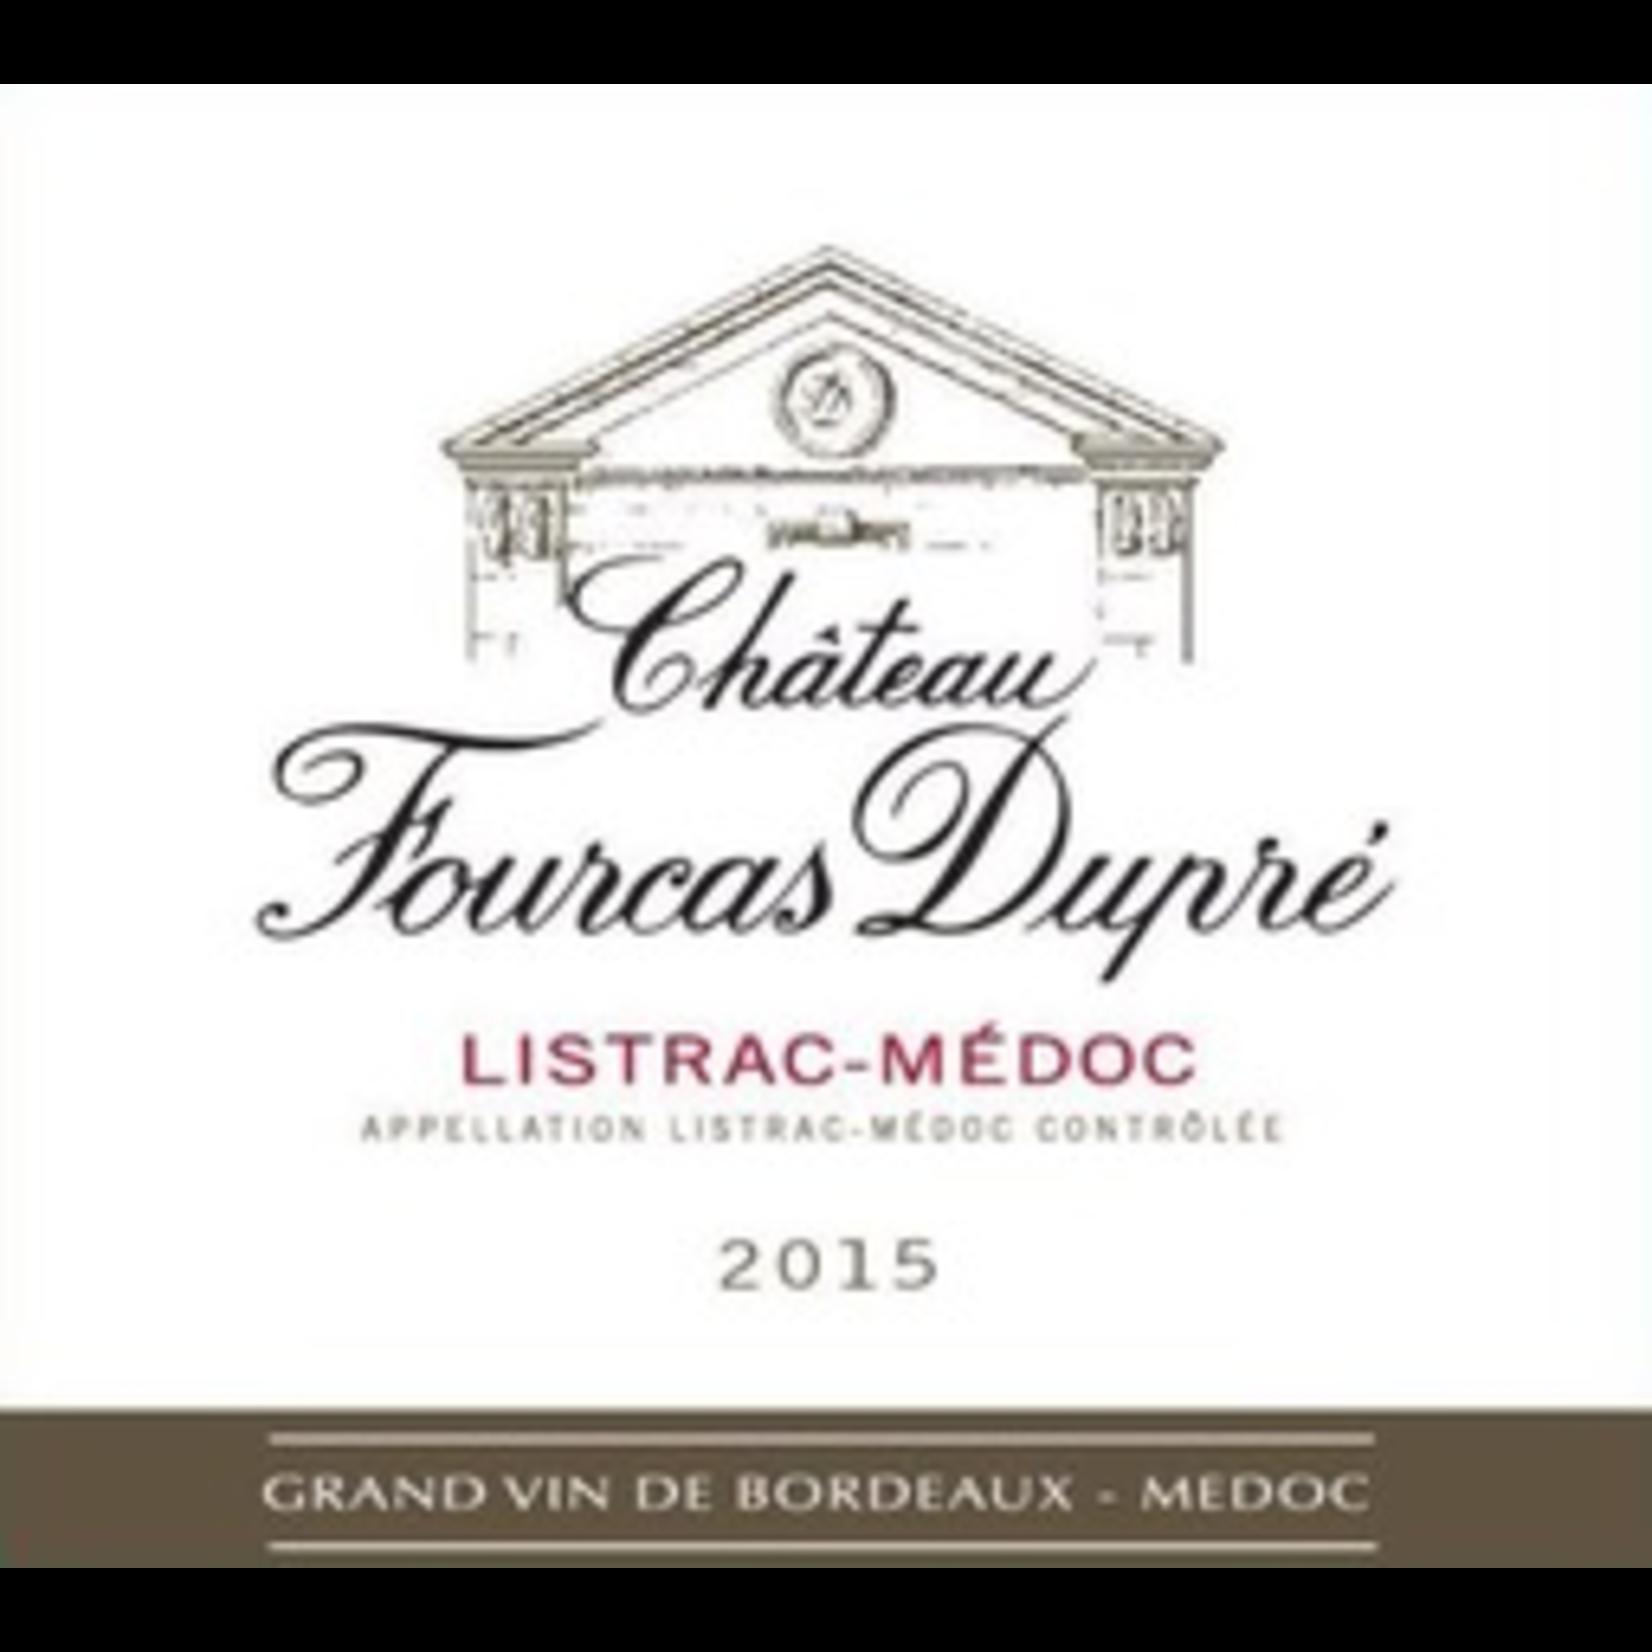 Wine Chateau Fourcas Dupre Listrac Medoc Kosher 2017